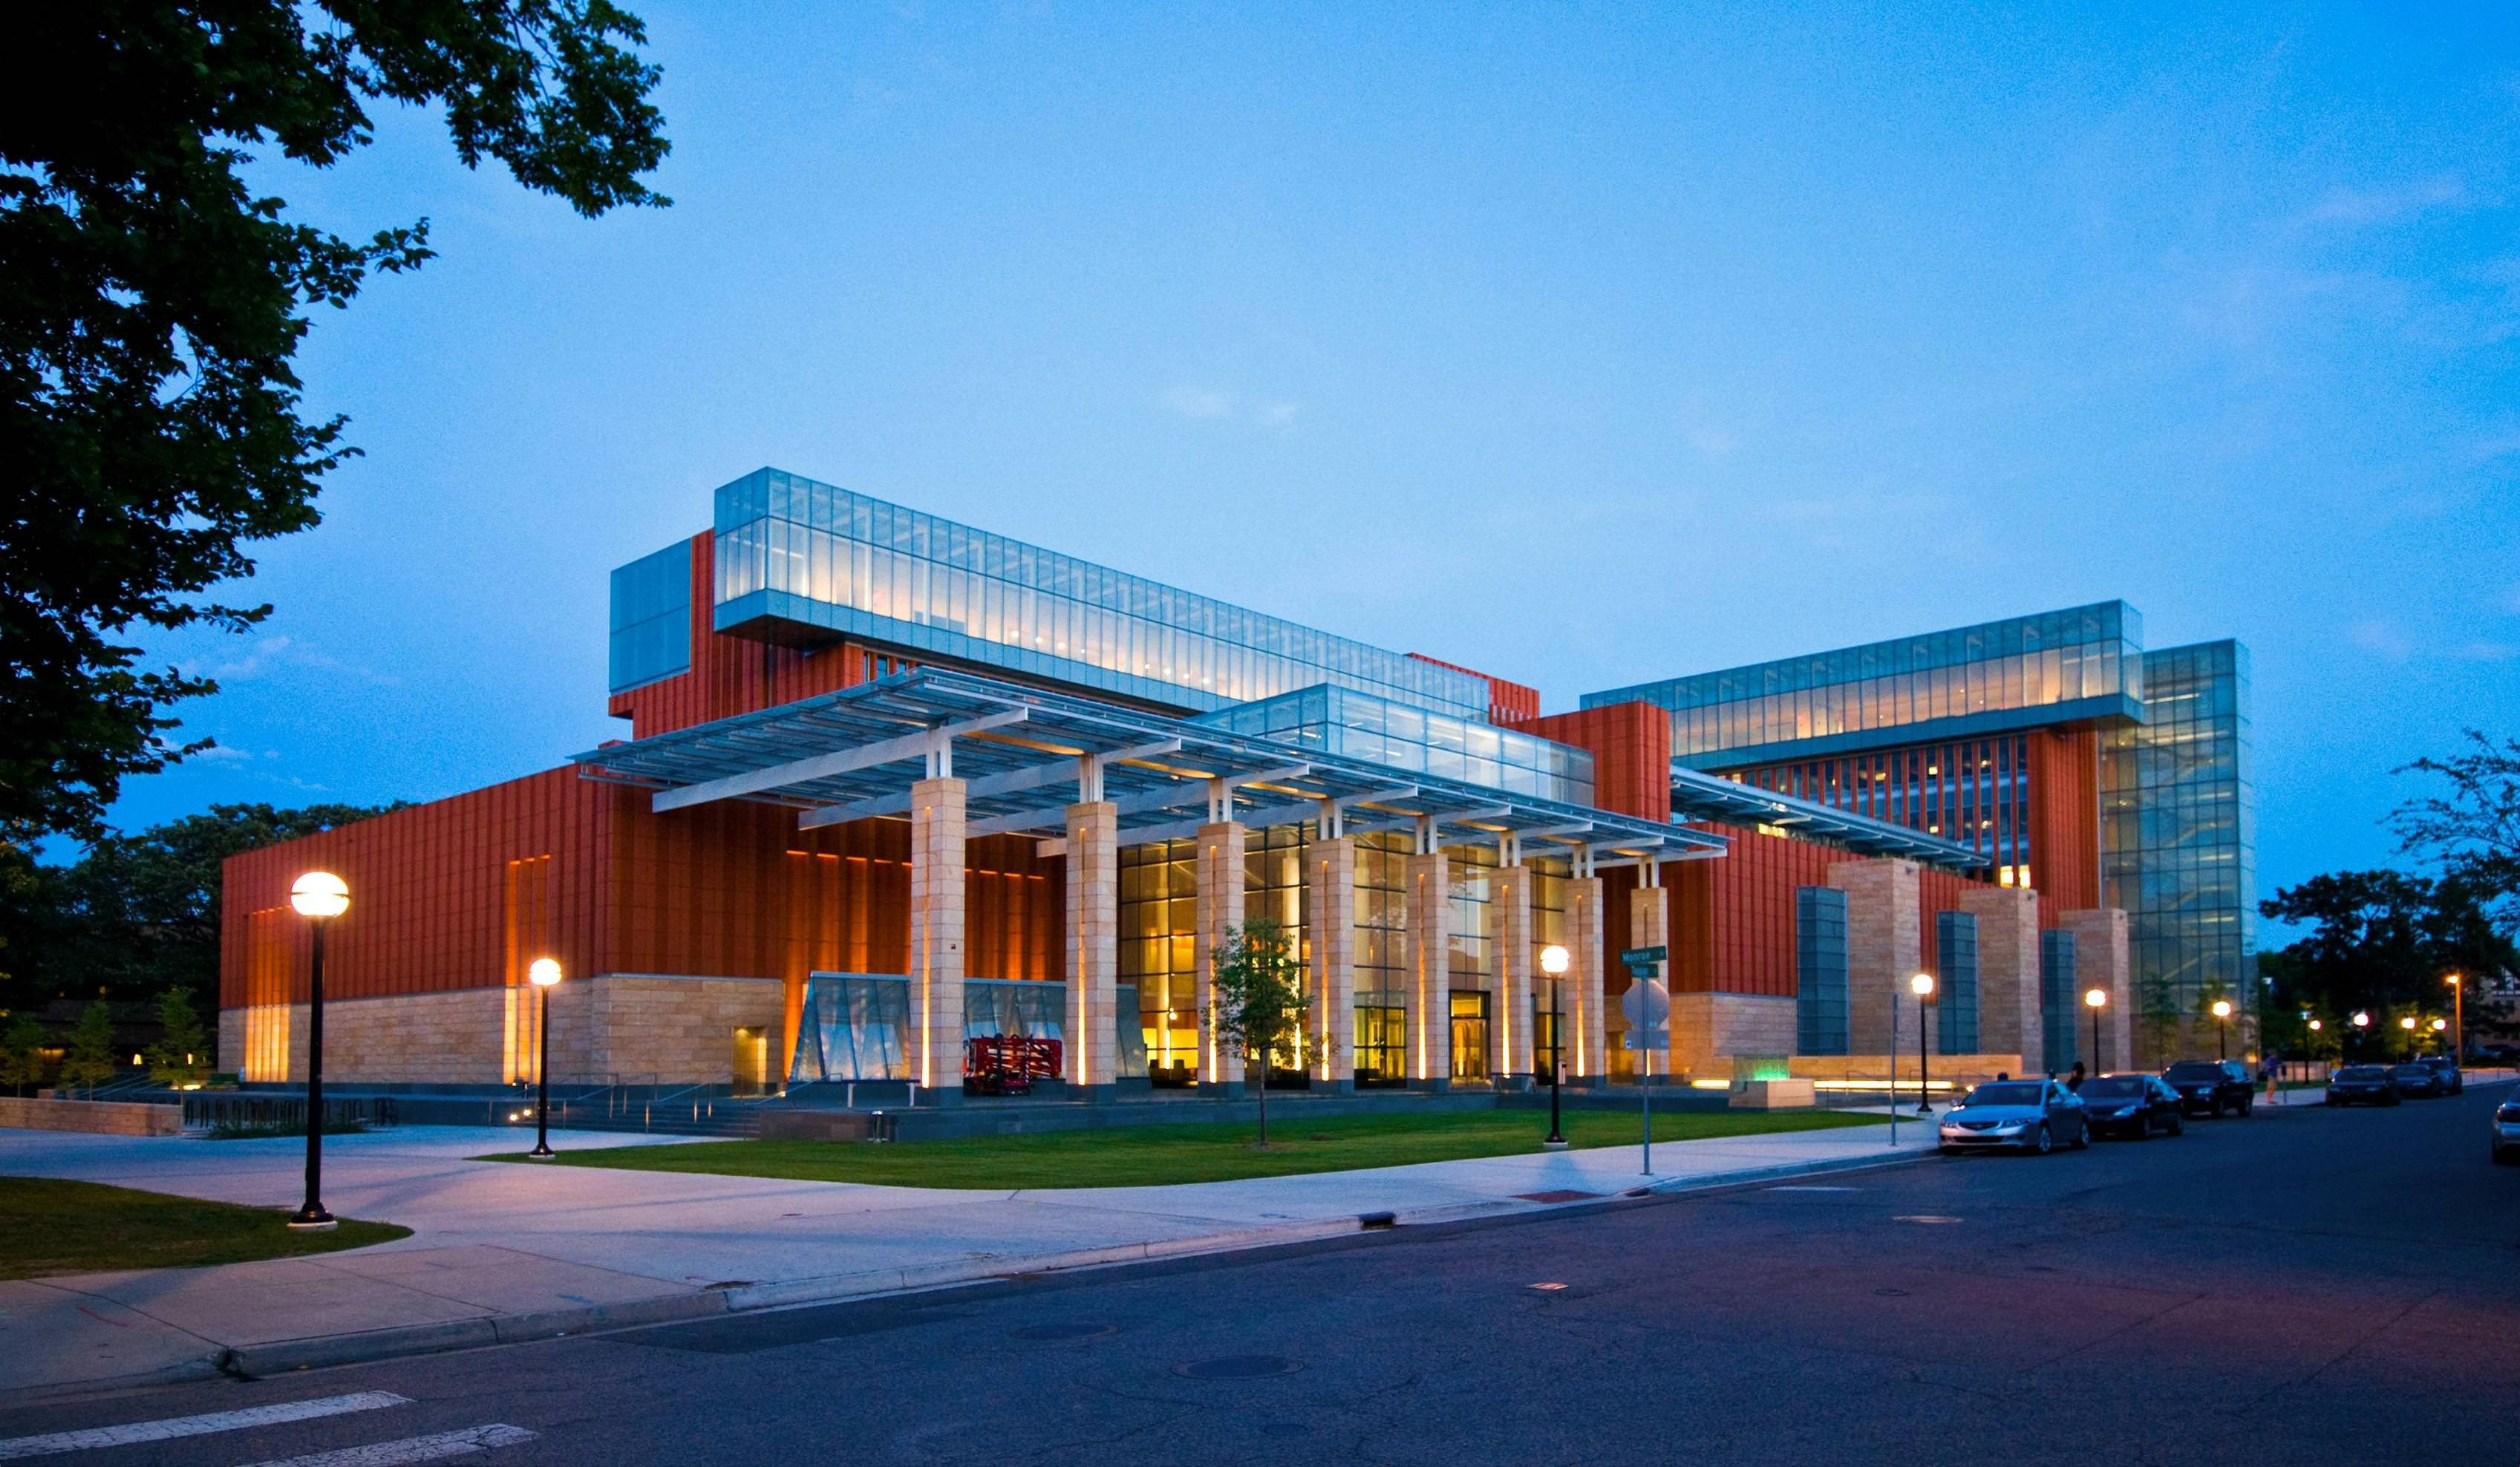 Architecture Michigan Ross School of Business Ann Arbor